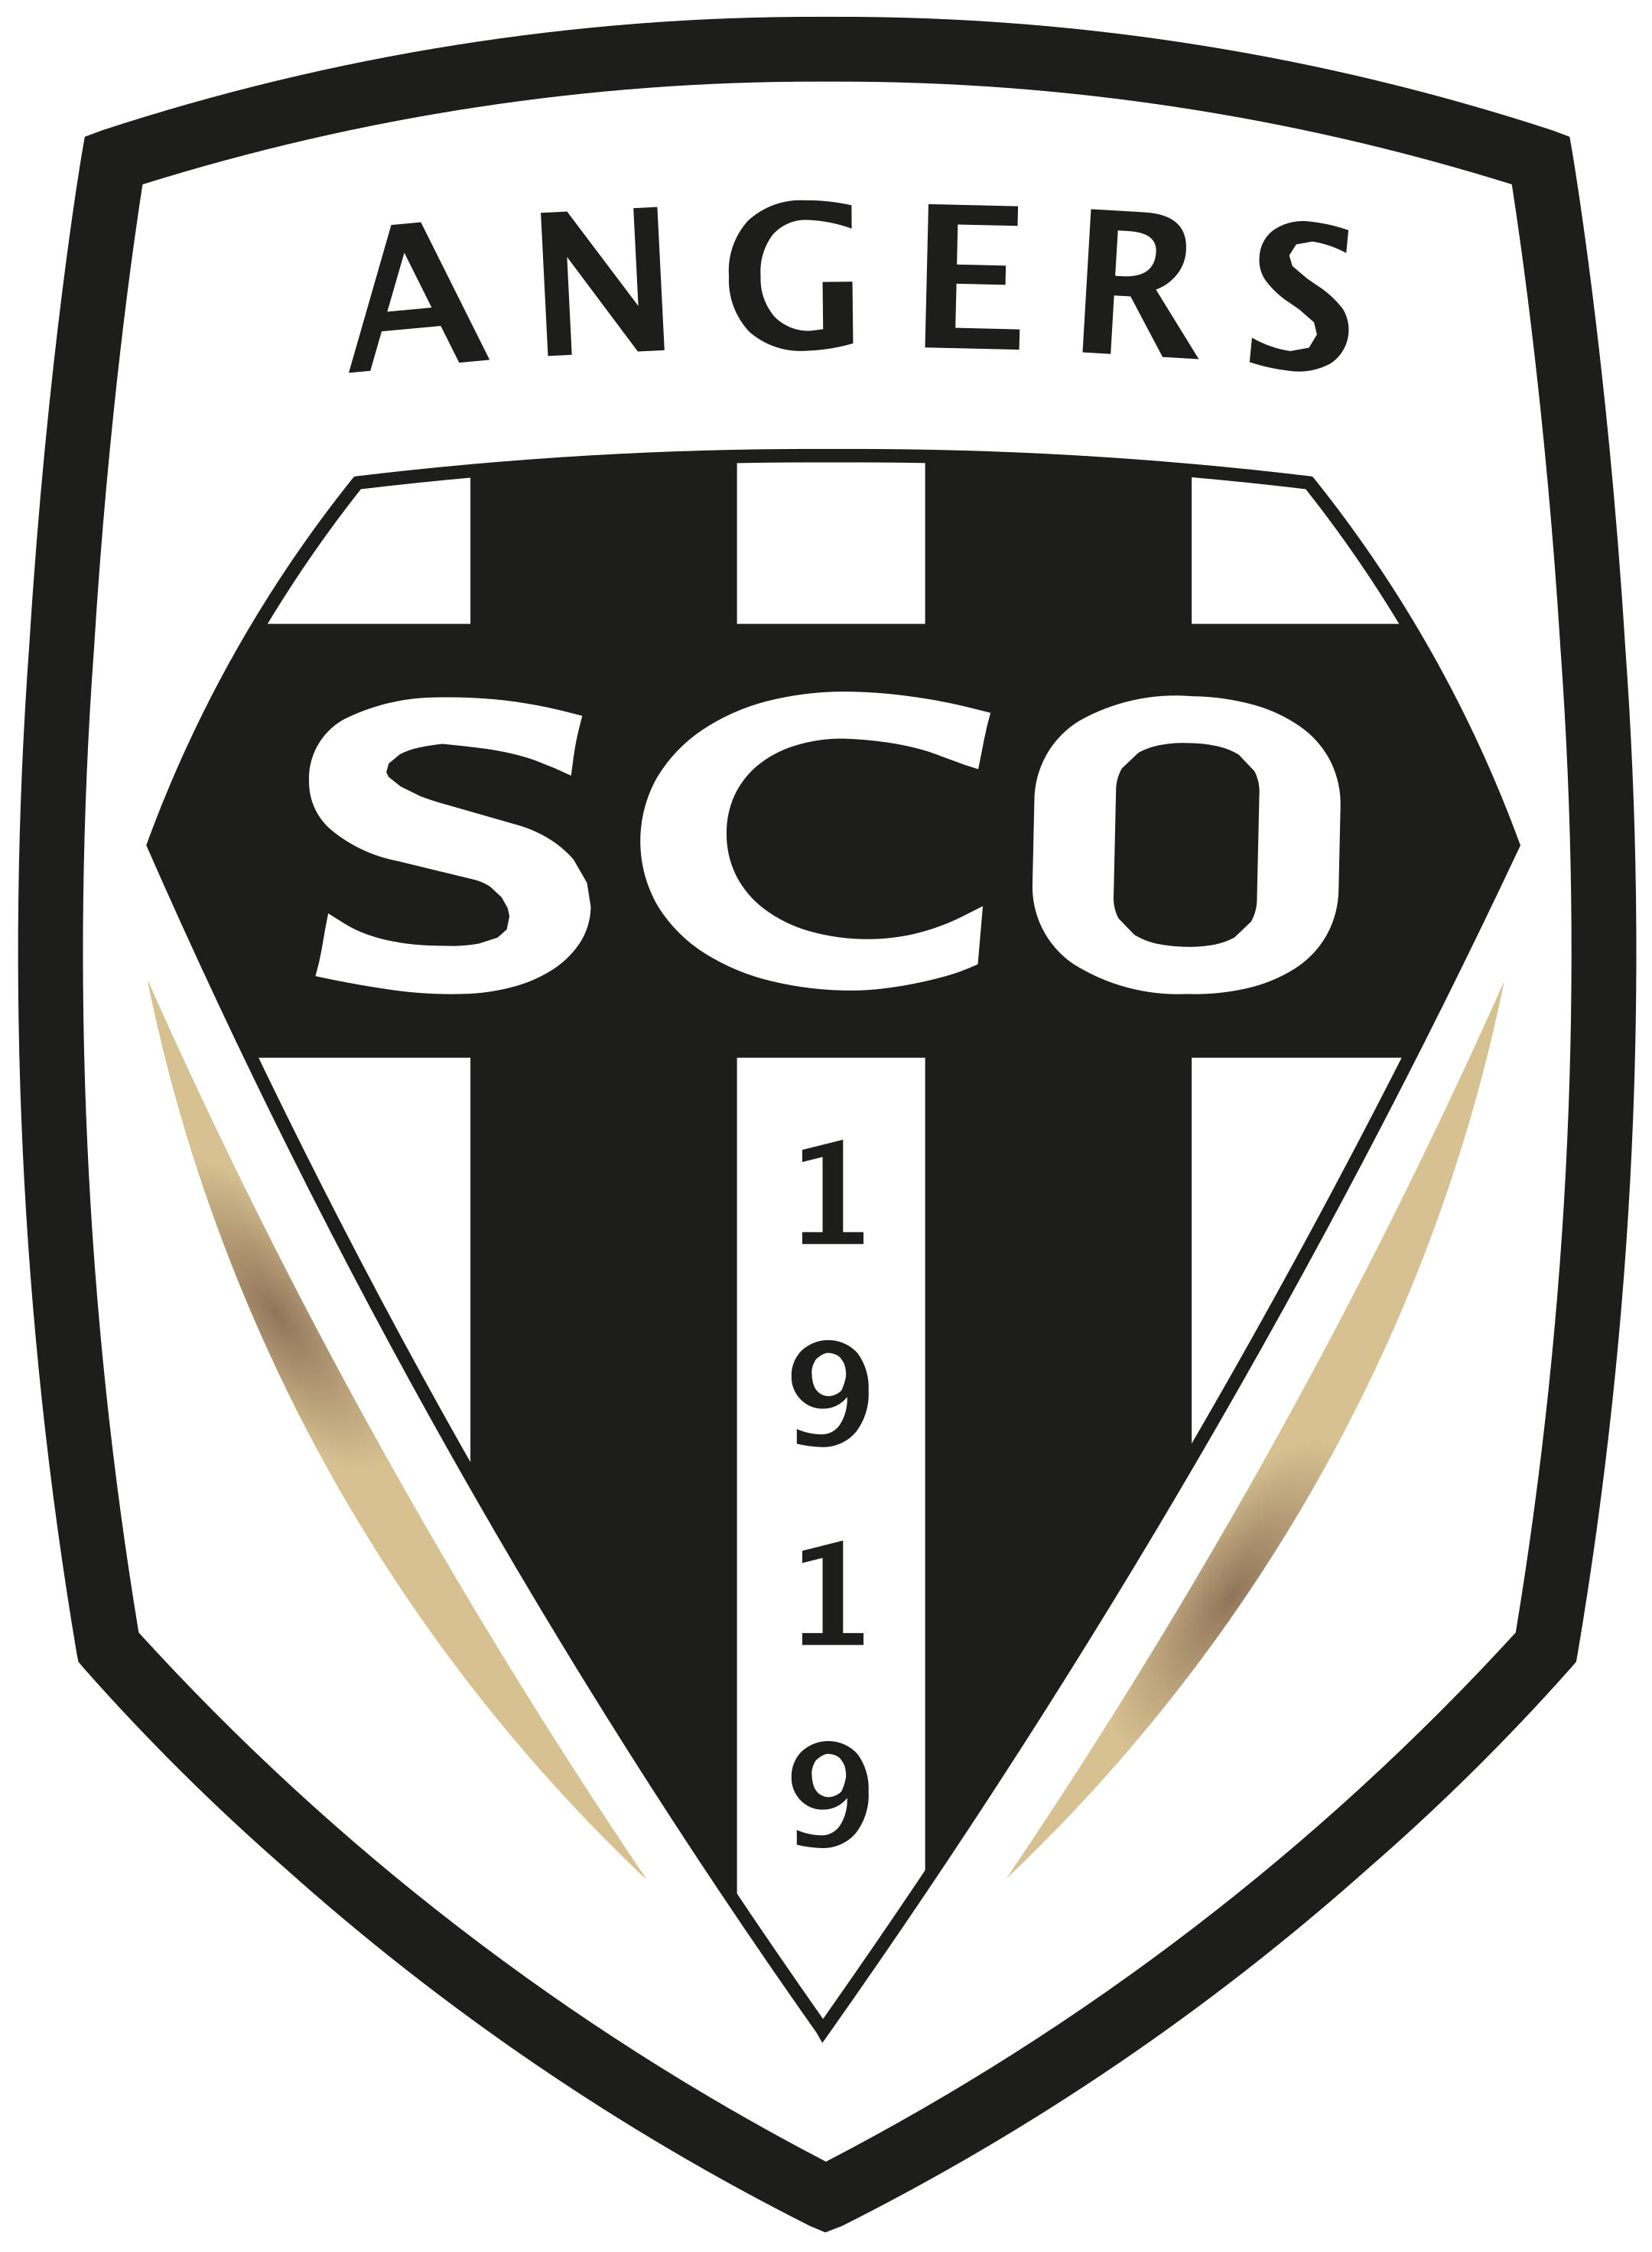 angers sco logo 1 - Angers SCO Logo